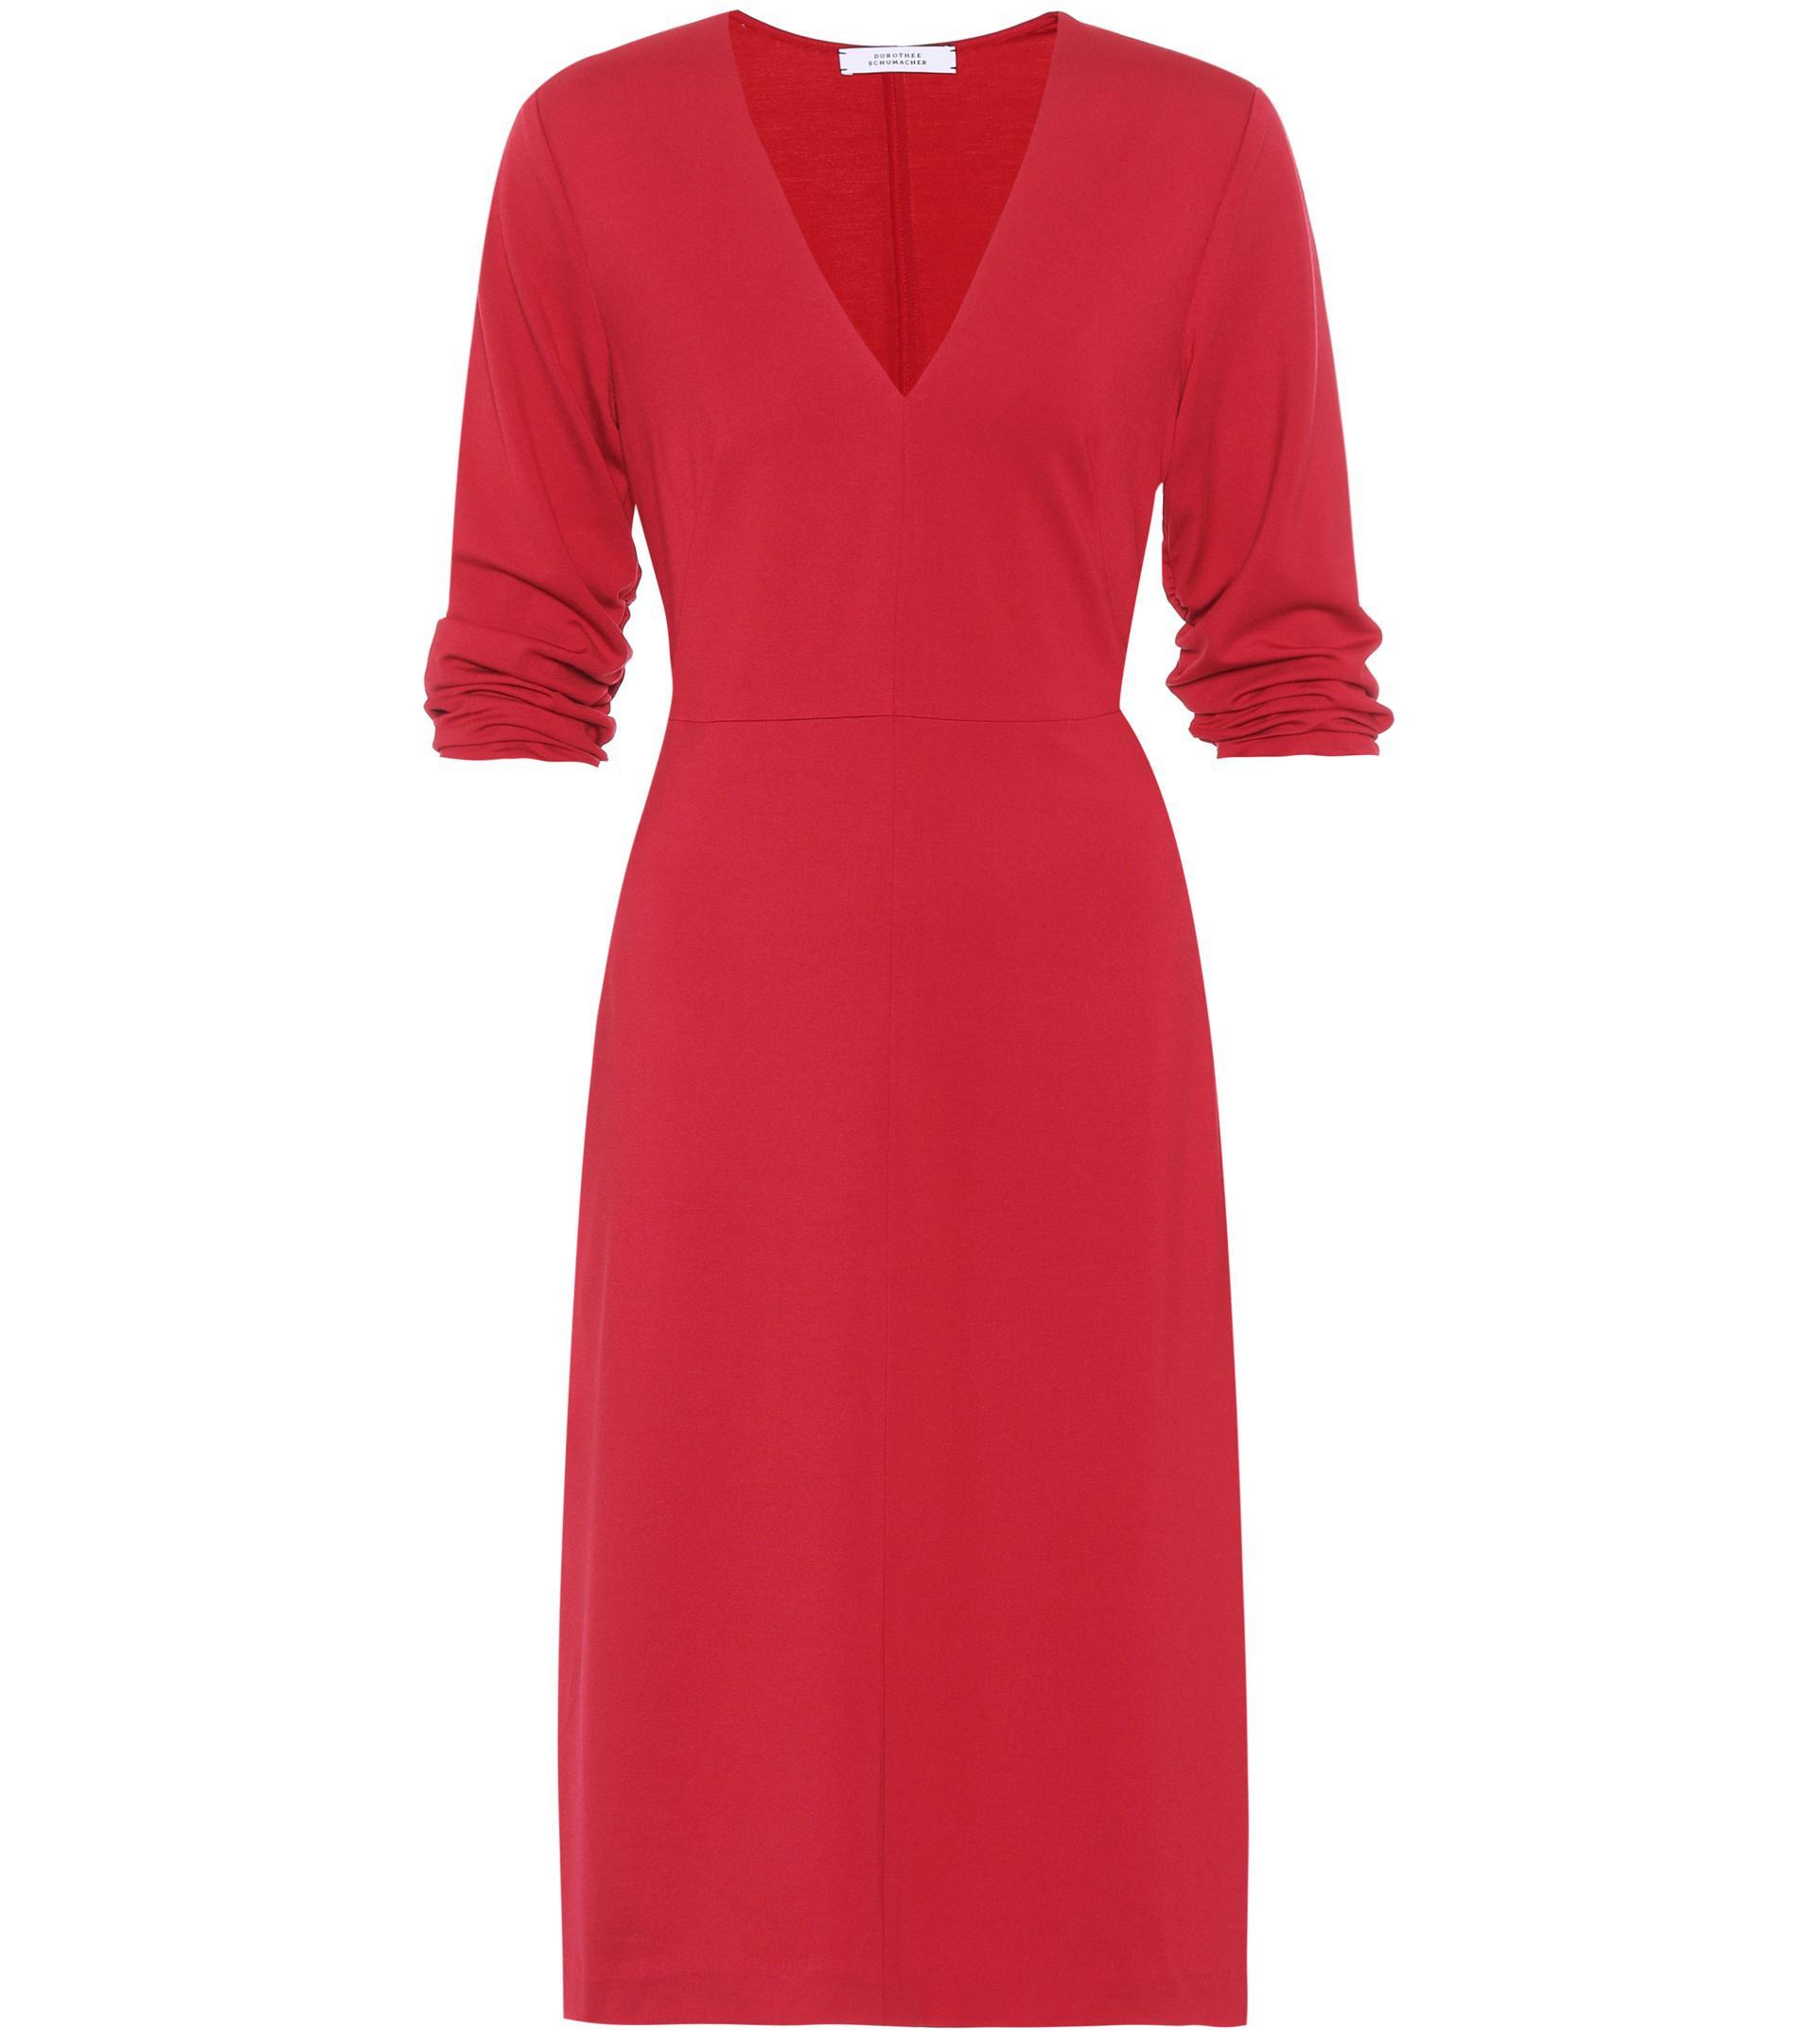 lyst dorothee schumacher effortless chic jersey dress in red save 8. Black Bedroom Furniture Sets. Home Design Ideas